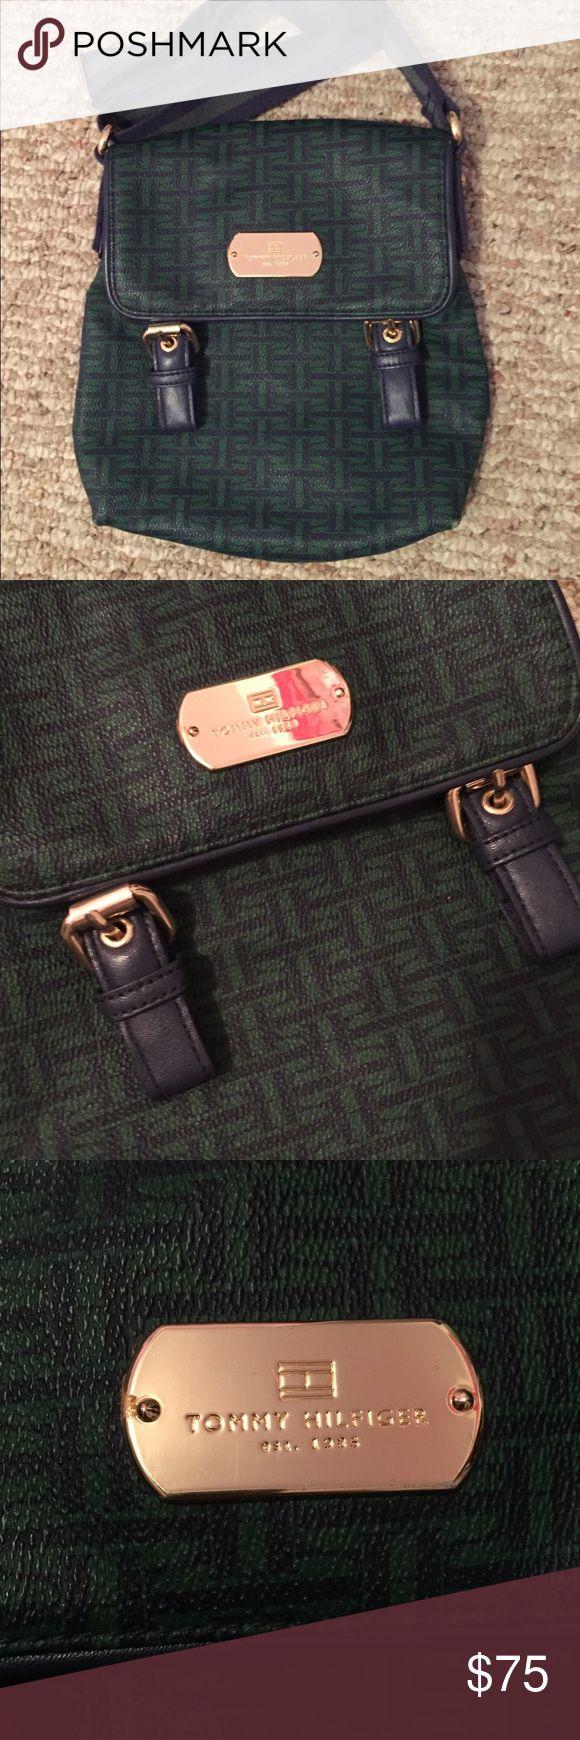 I just added this listing on Poshmark: Tommy Hilfiger Crossbody bag NWOT. #shopmycloset #poshmark #fashion #shopping #style #forsale #Tommy Hilfiger #Handbags